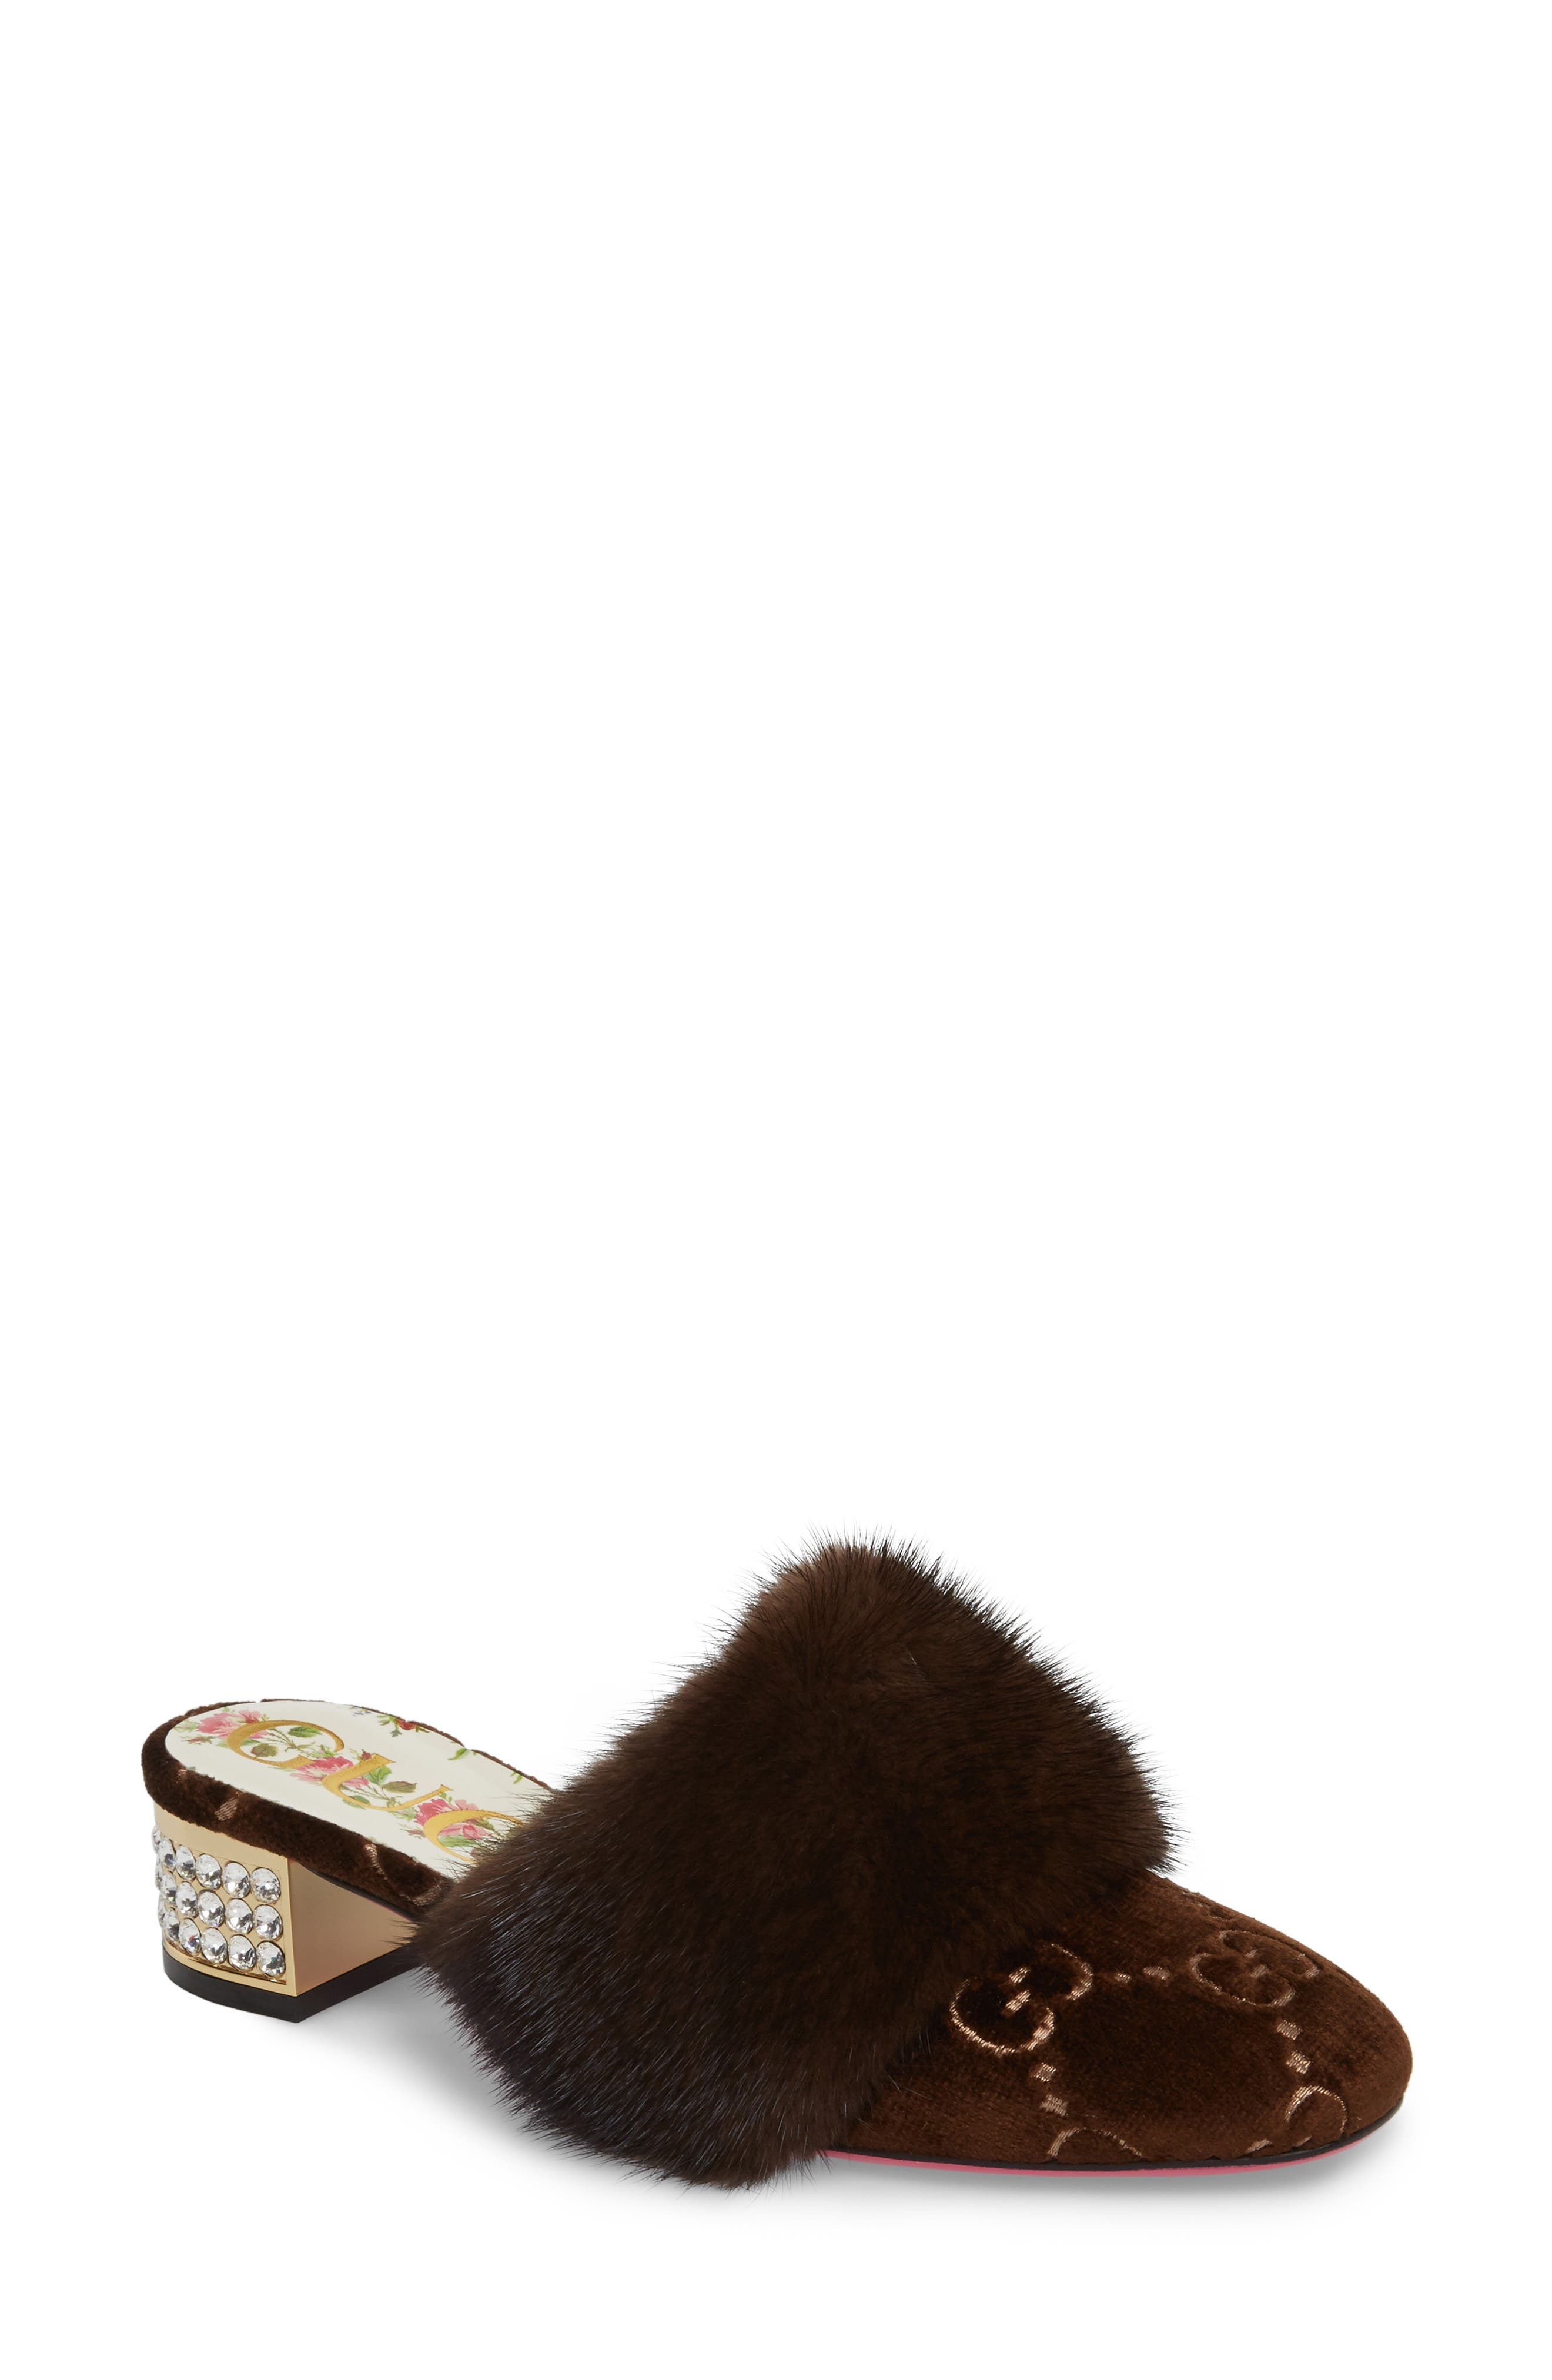 Main Image - Gucci Candy Genuine Mink Fur Mule (Women)